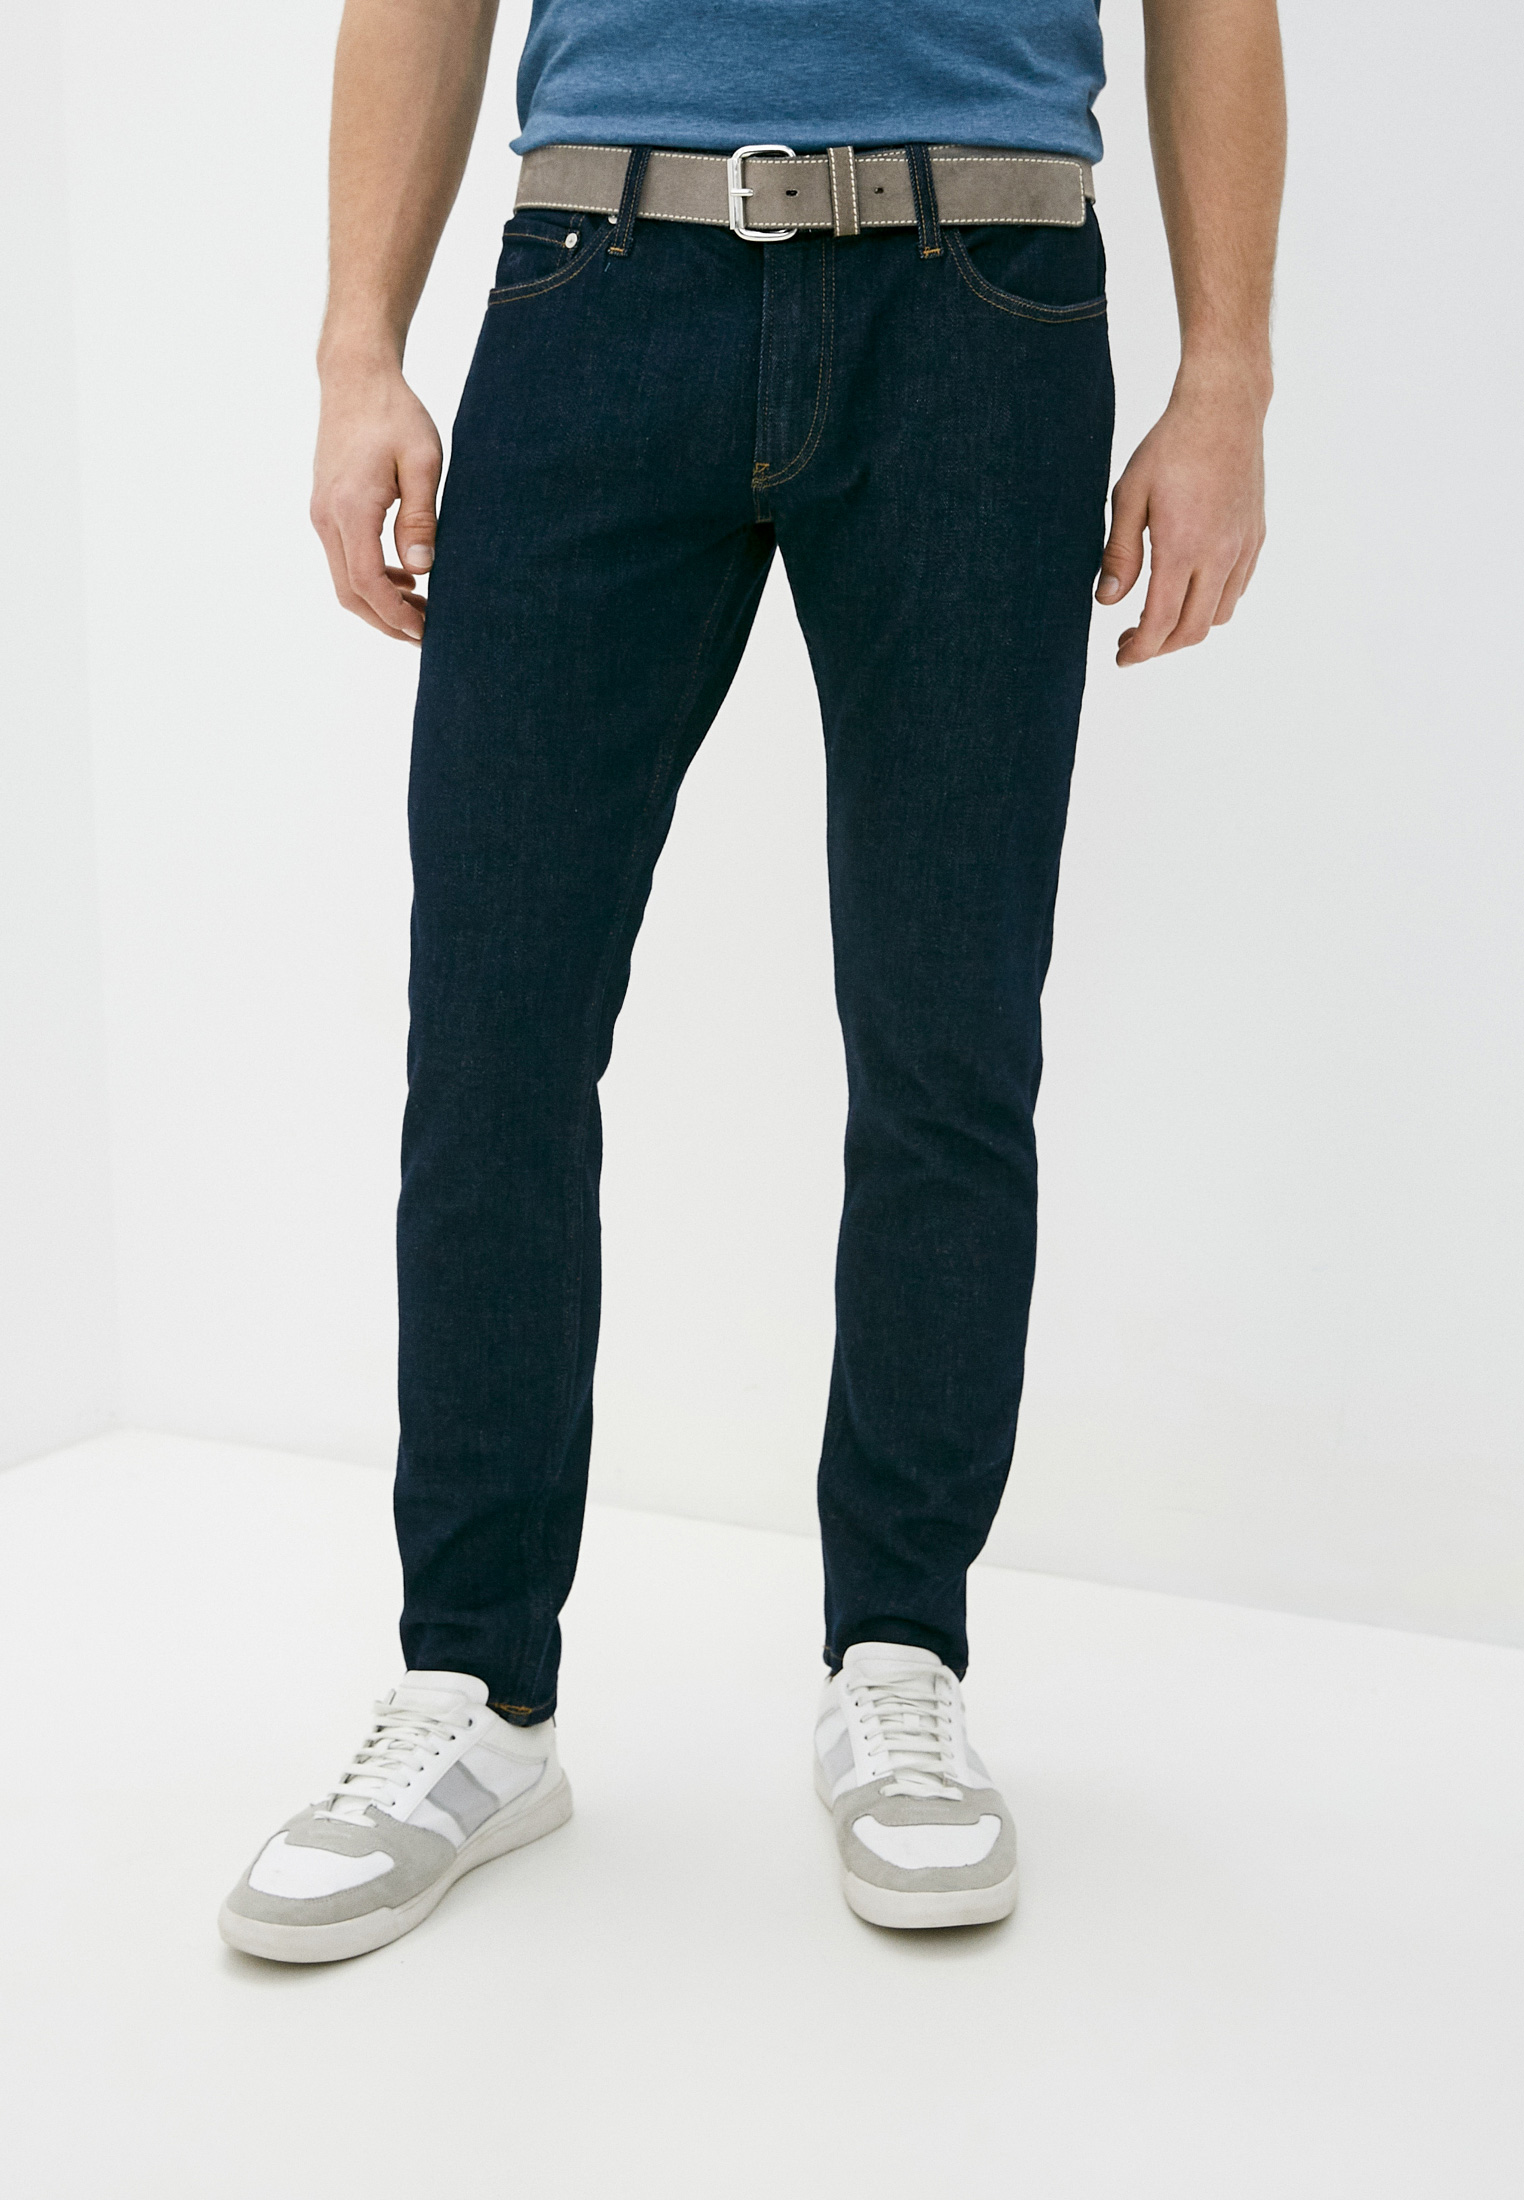 Зауженные джинсы Calvin Klein (Кельвин Кляйн) K10K107005